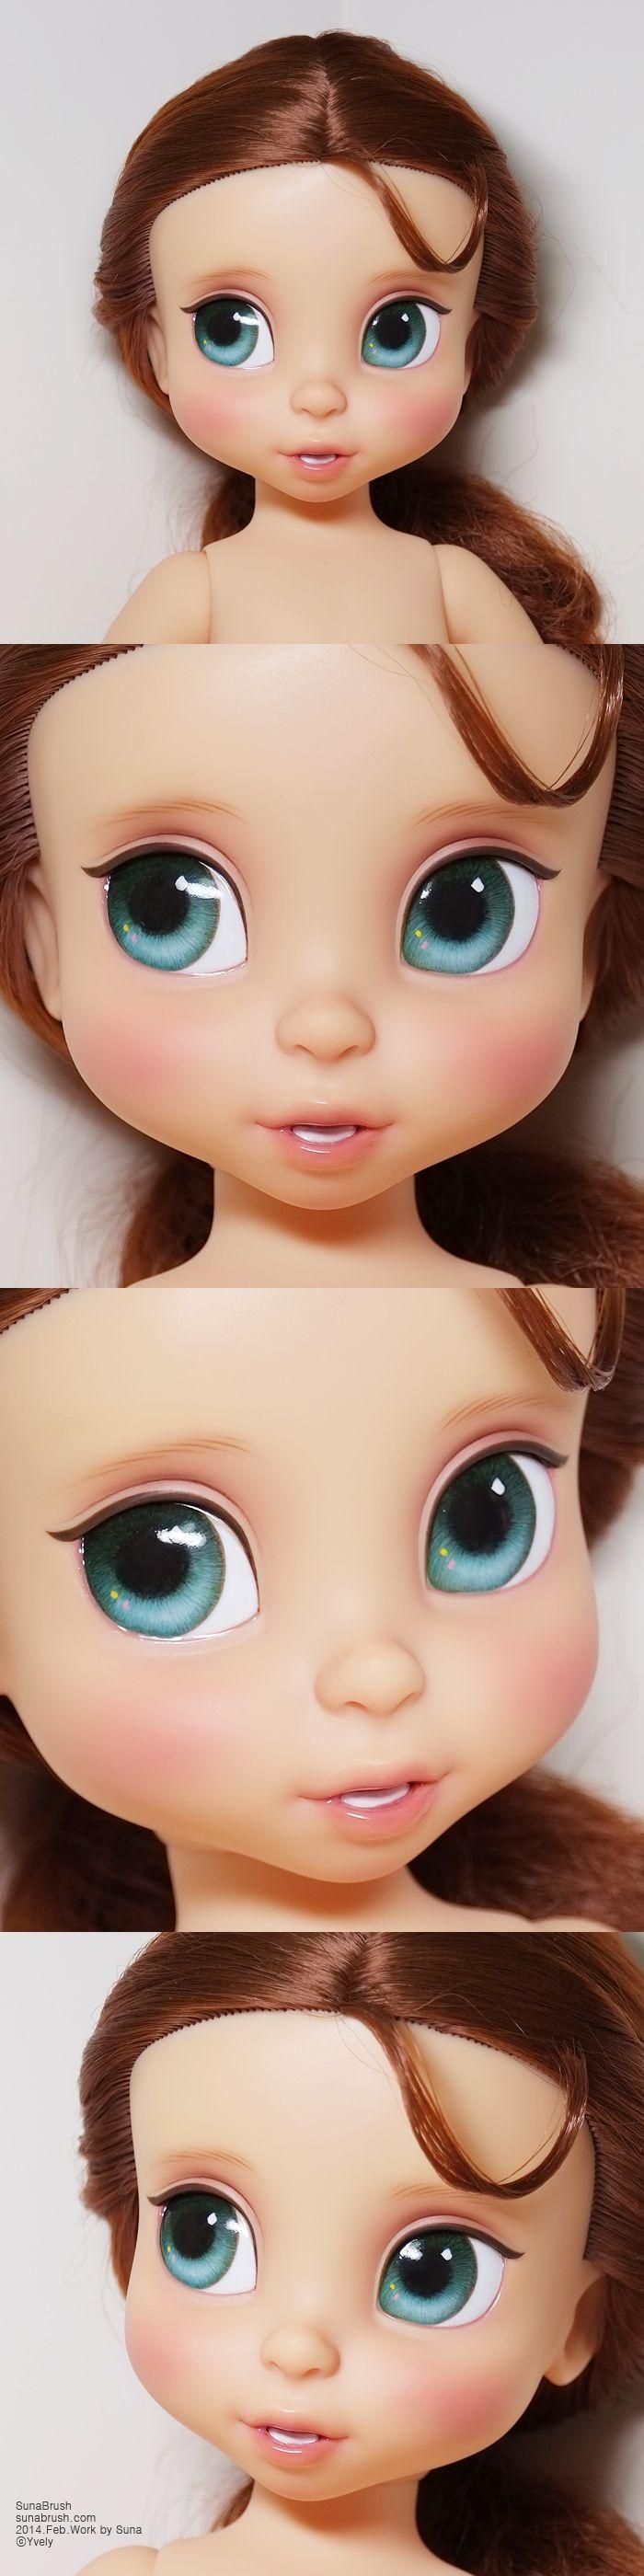 Disney Animators Collection Dolls - Belle by Yvely.deviantart.com on @DeviantArt